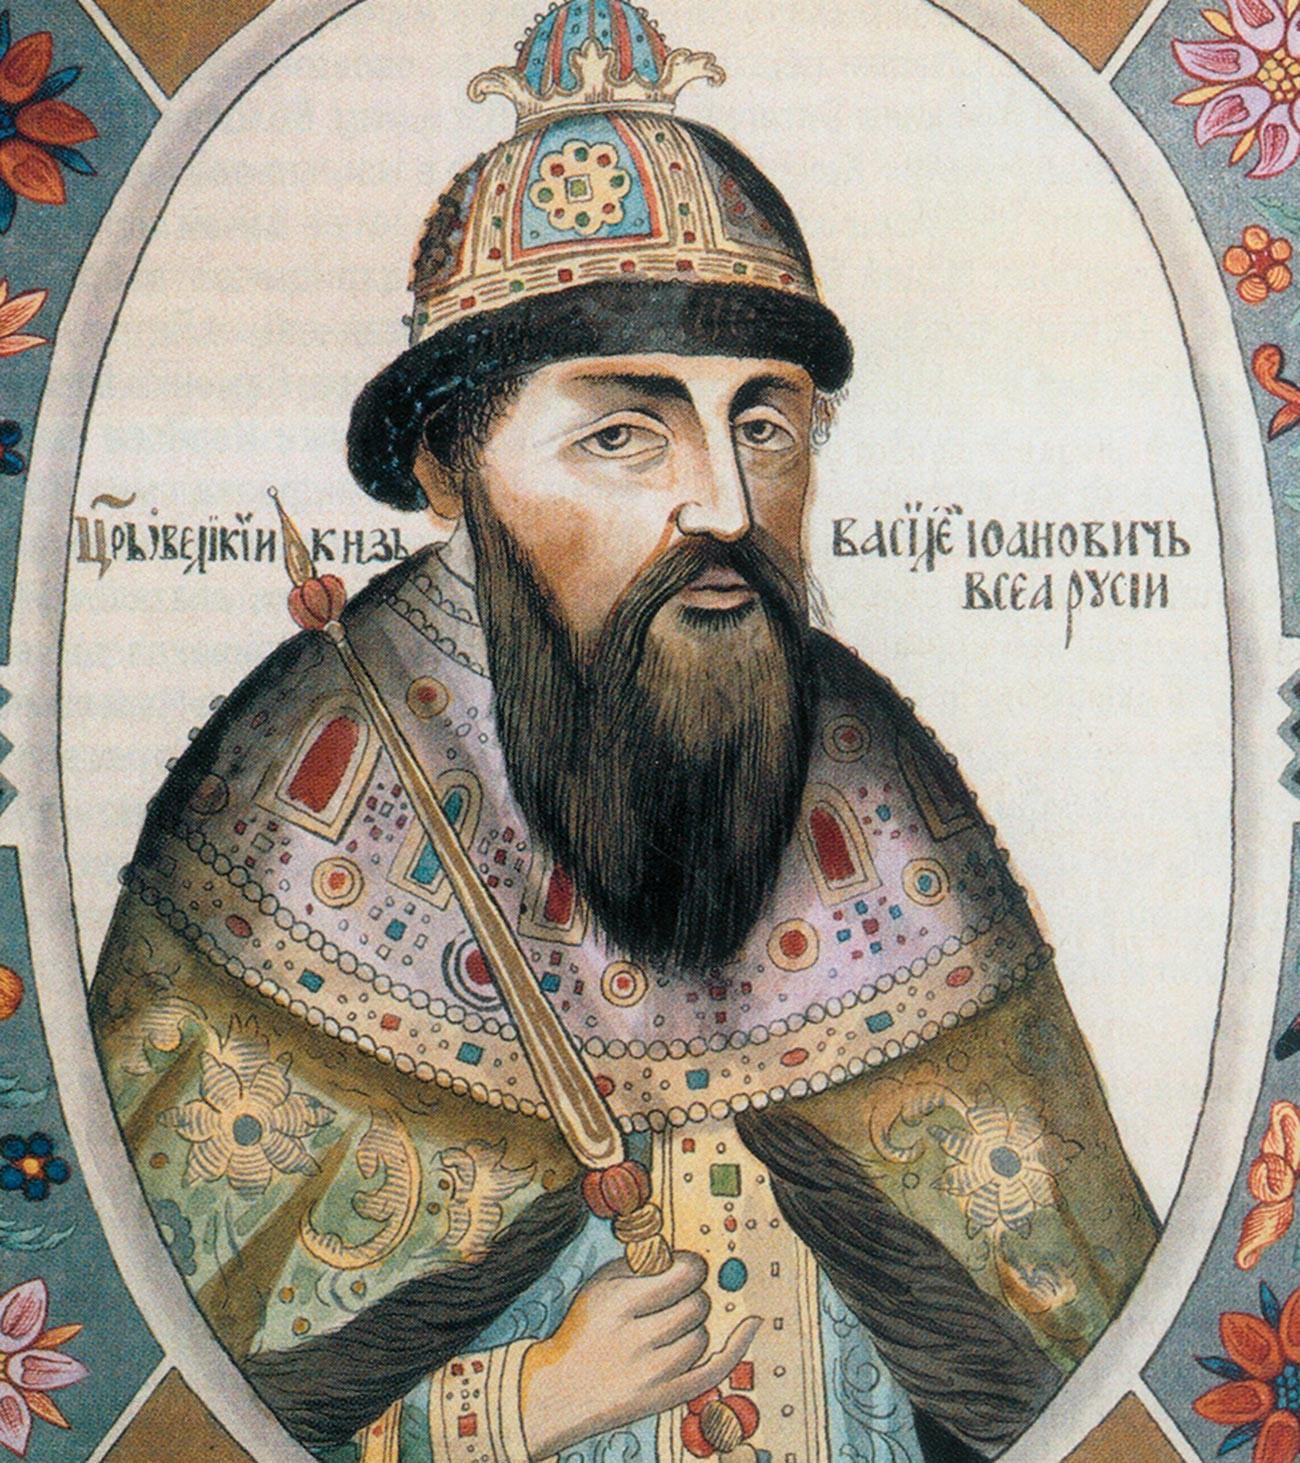 Vasiliy Shuisky